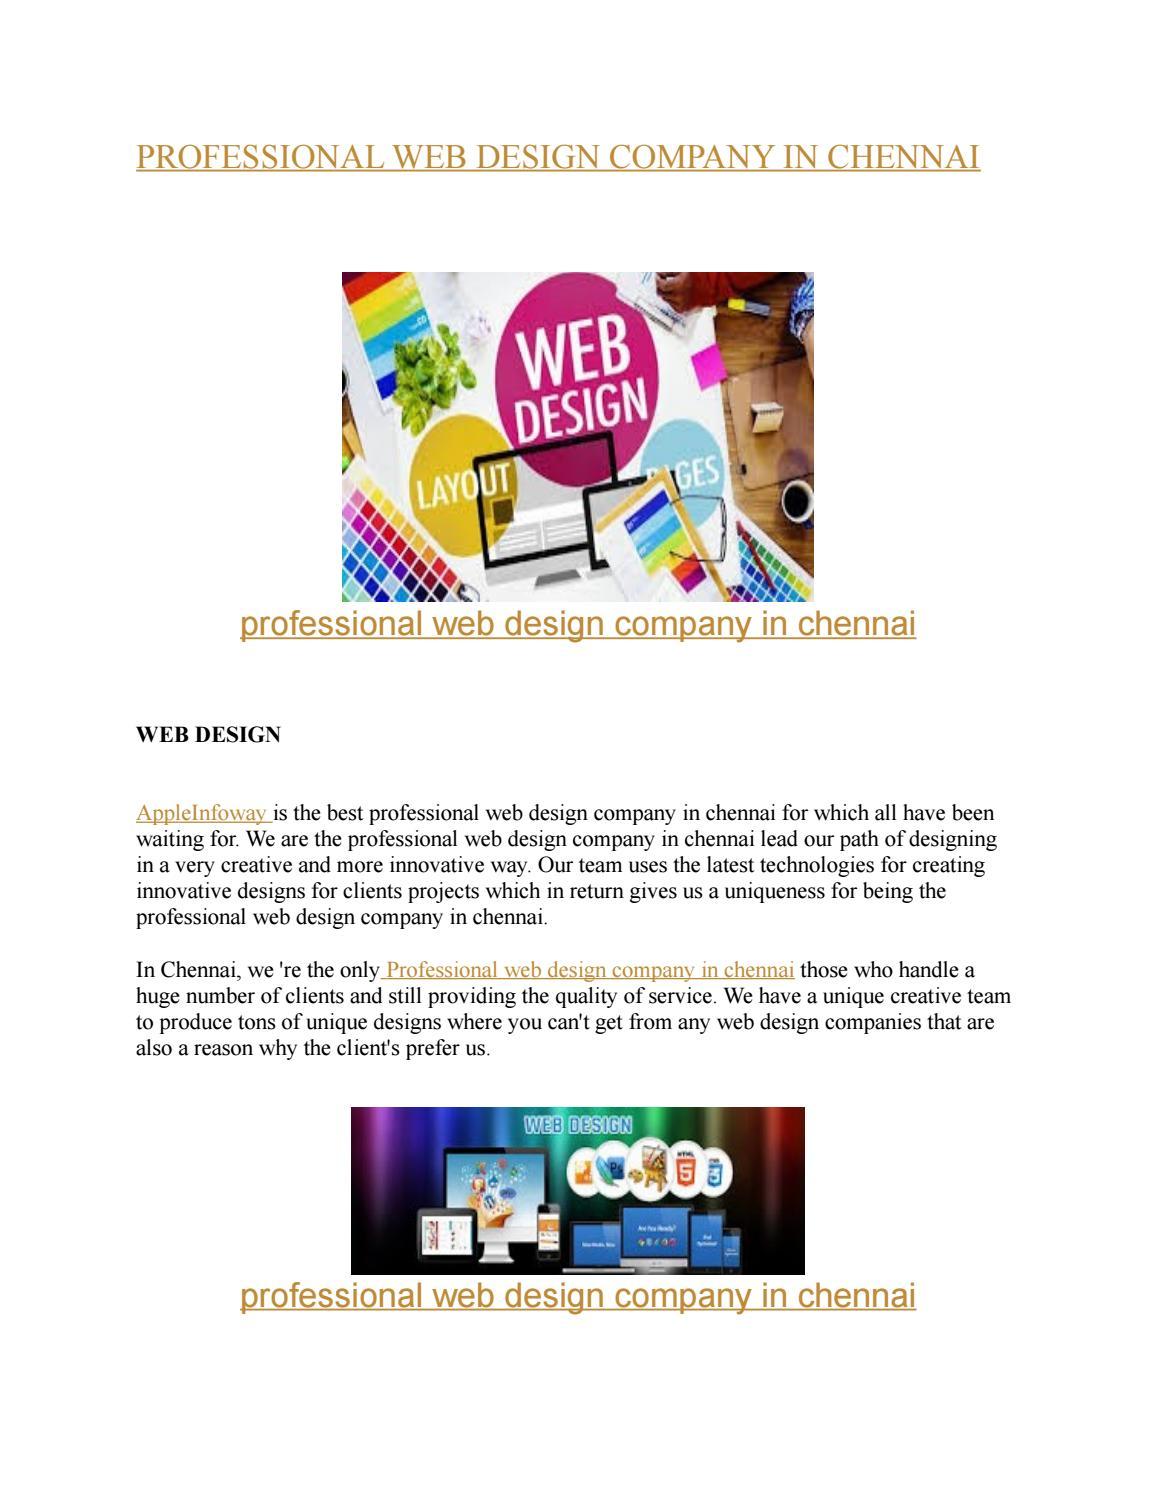 Professional Web Design Company In Chennai By Veronicaandrews2808 Issuu